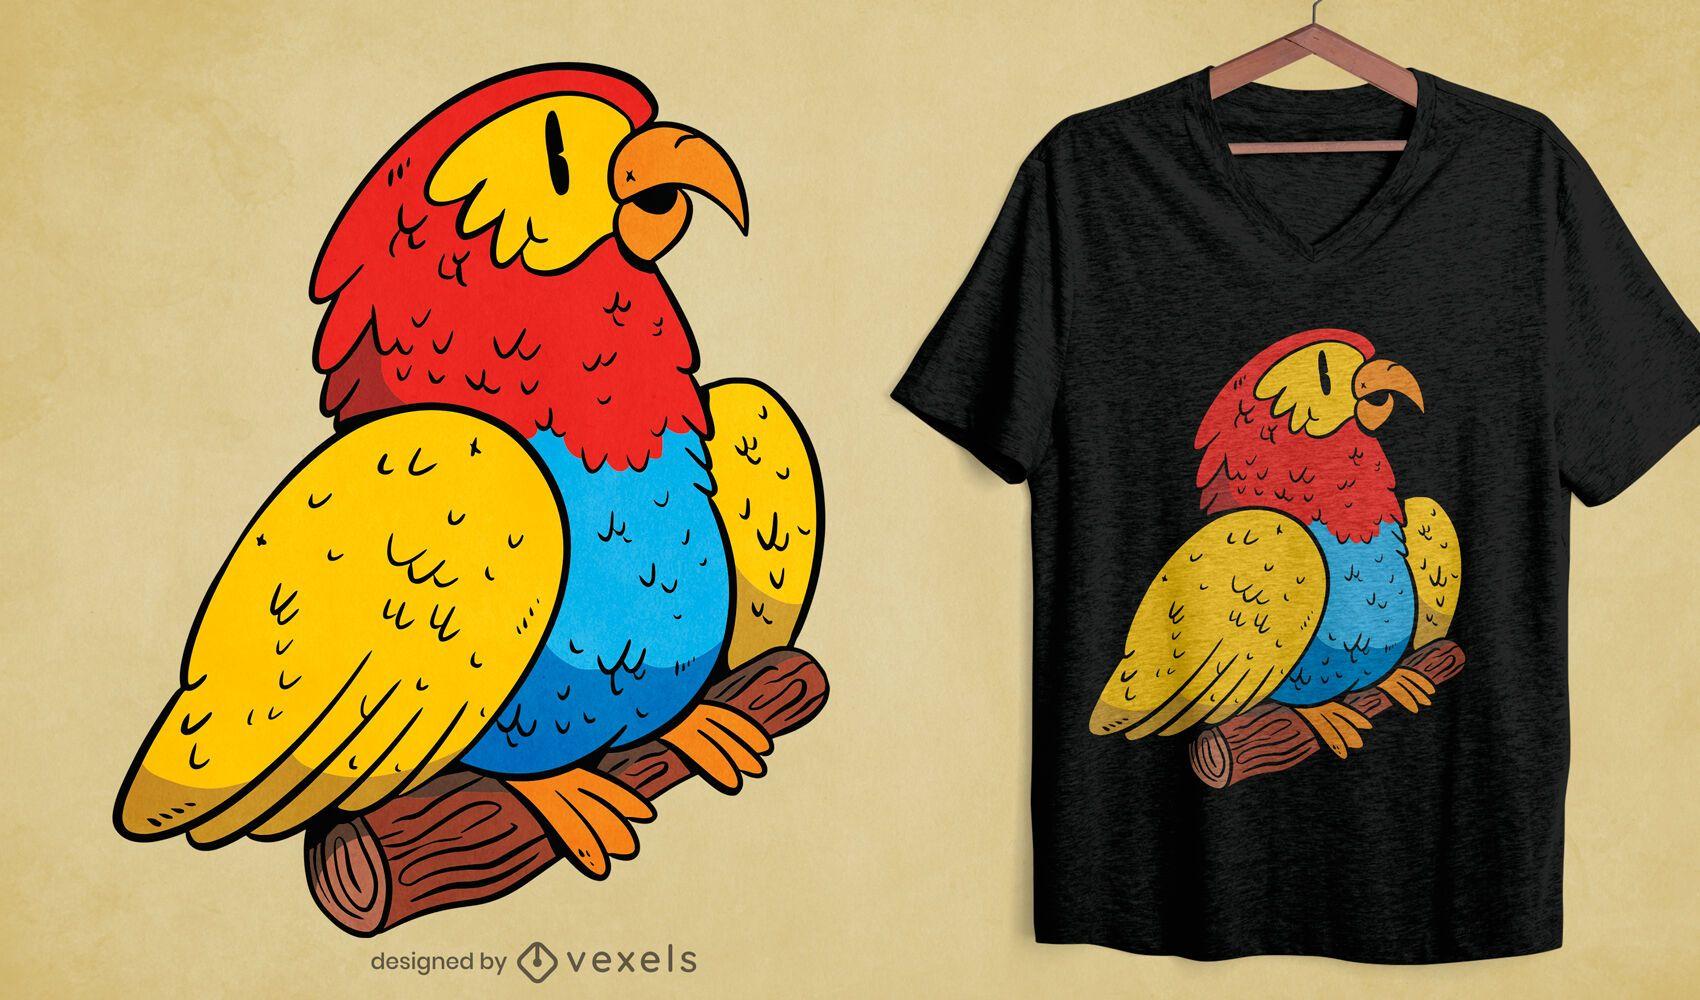 Colorful parrot animal t-shirt design